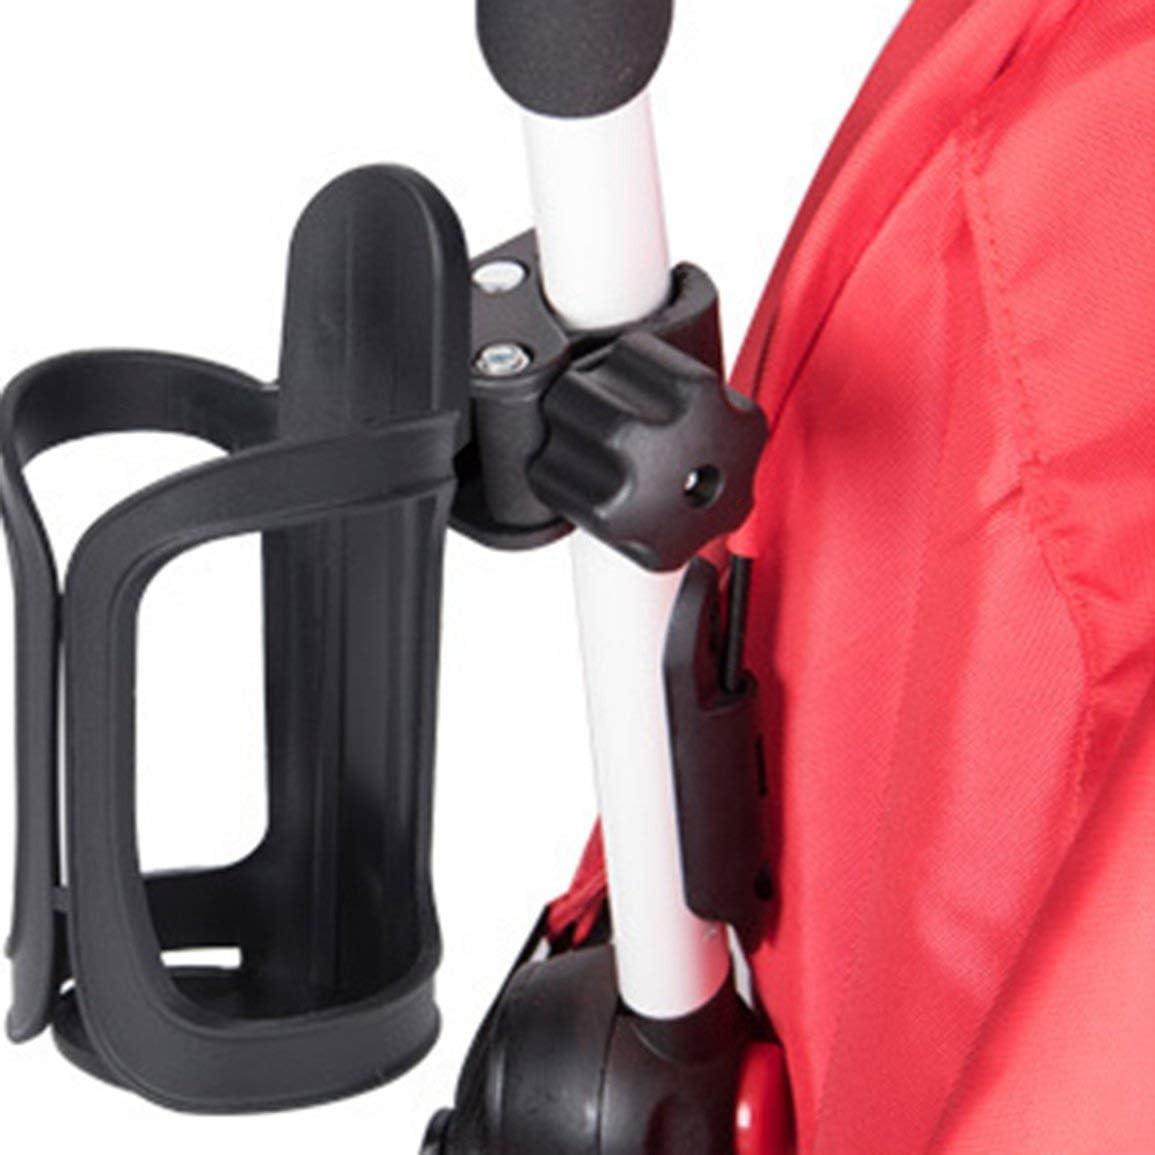 Color:Black Baby Stroller Accessories Cup Holder Cart Bottle Rack For Milk Water Pushchair Carriage Buggy Adjustable Black